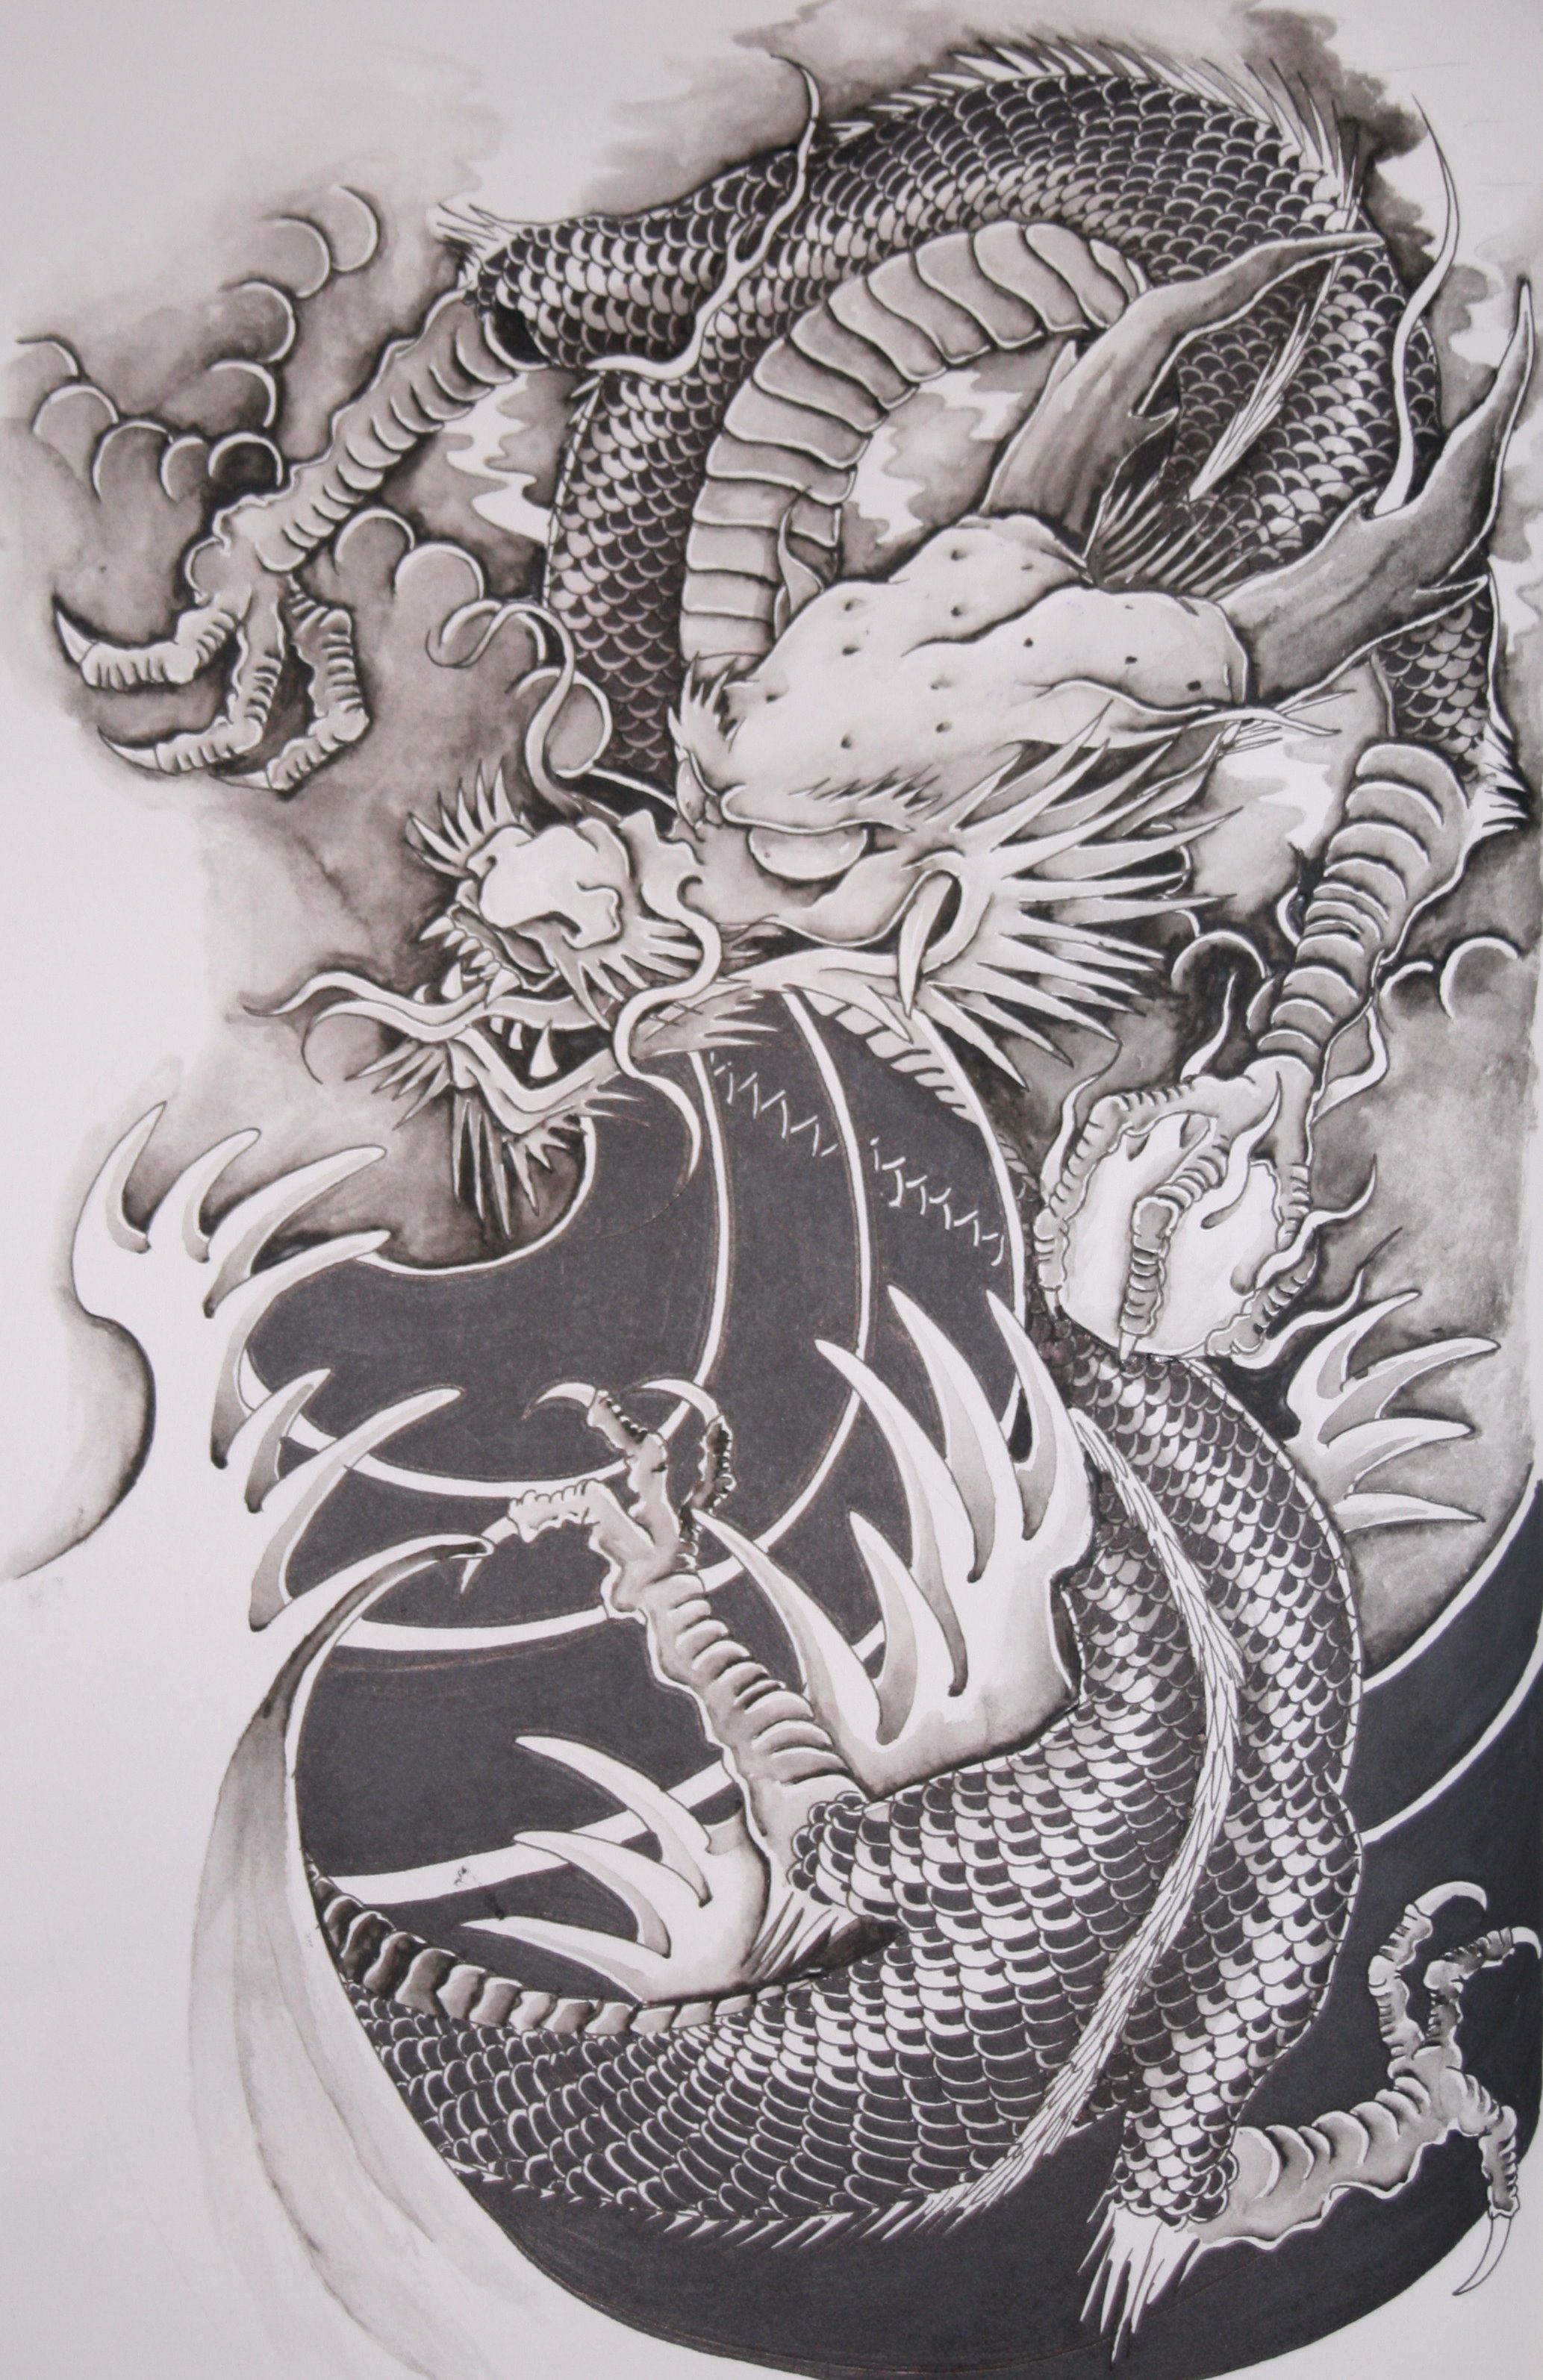 Japanese Dragon: Japanese Dragon Tattoo Wallpapers